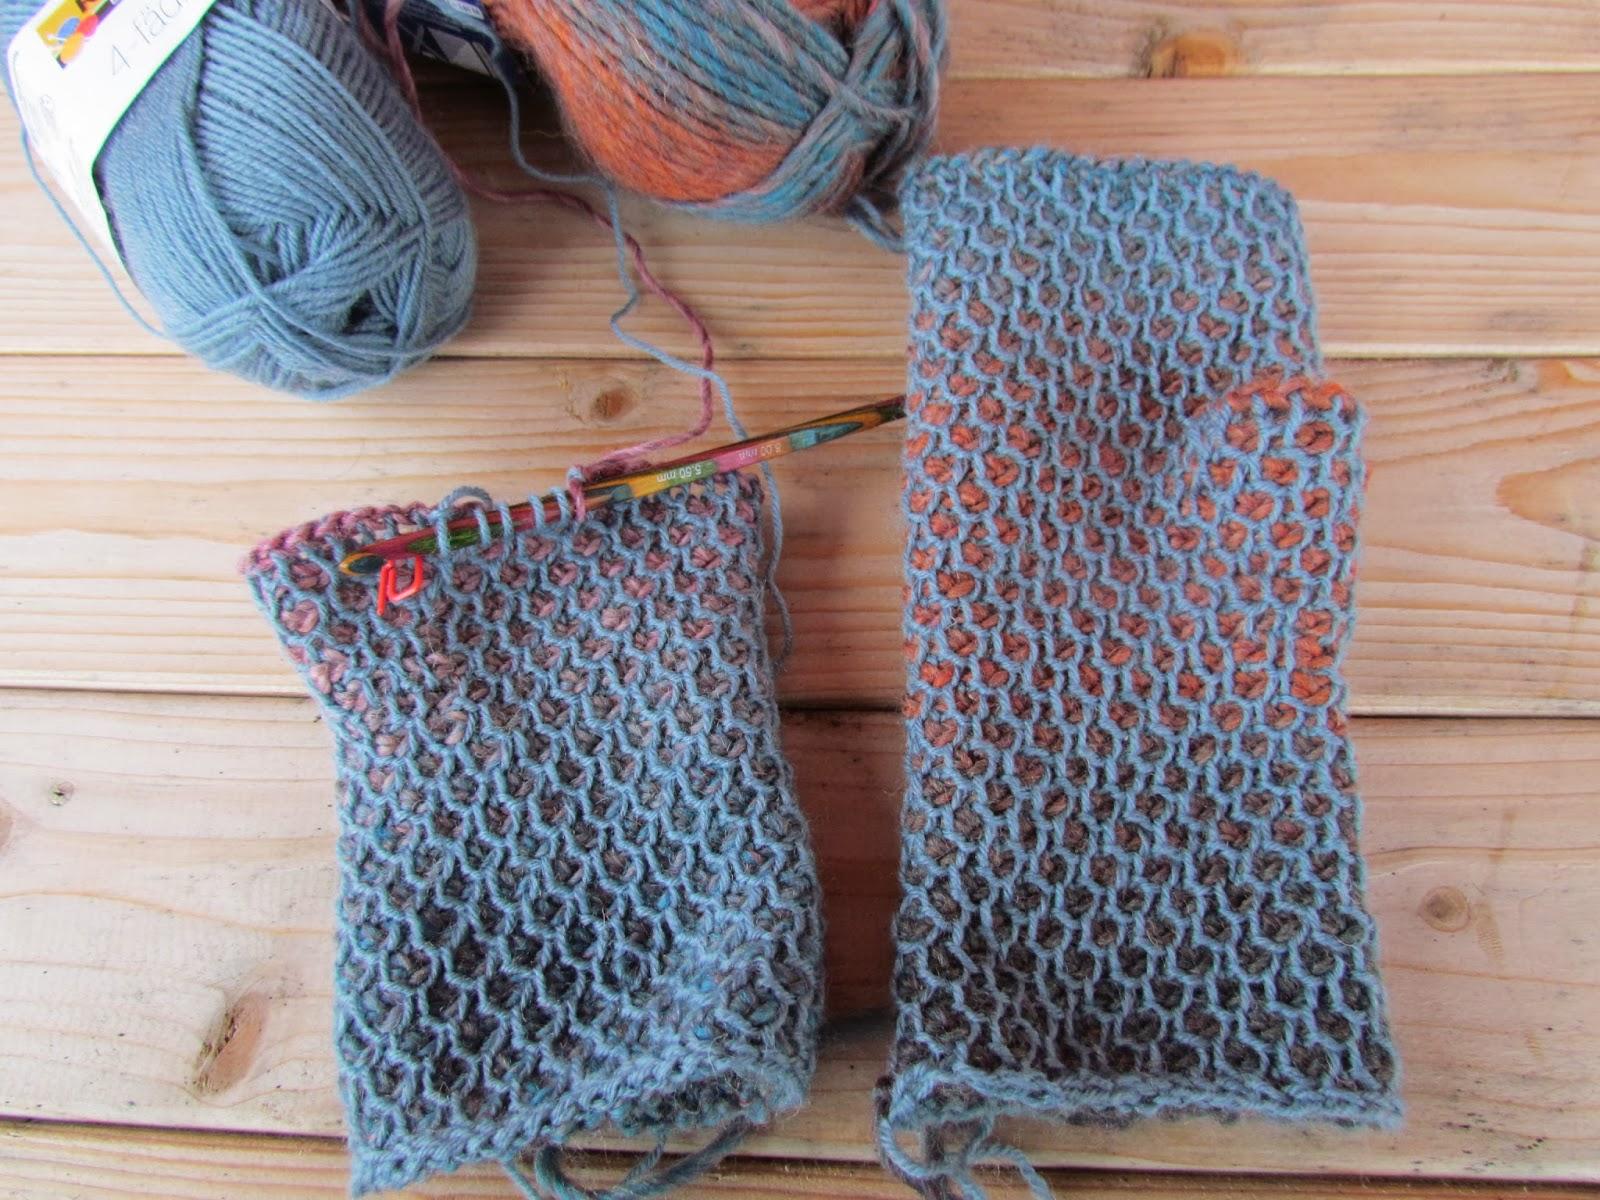 kotkarankki: Tunisian Crochet and playing with yarn